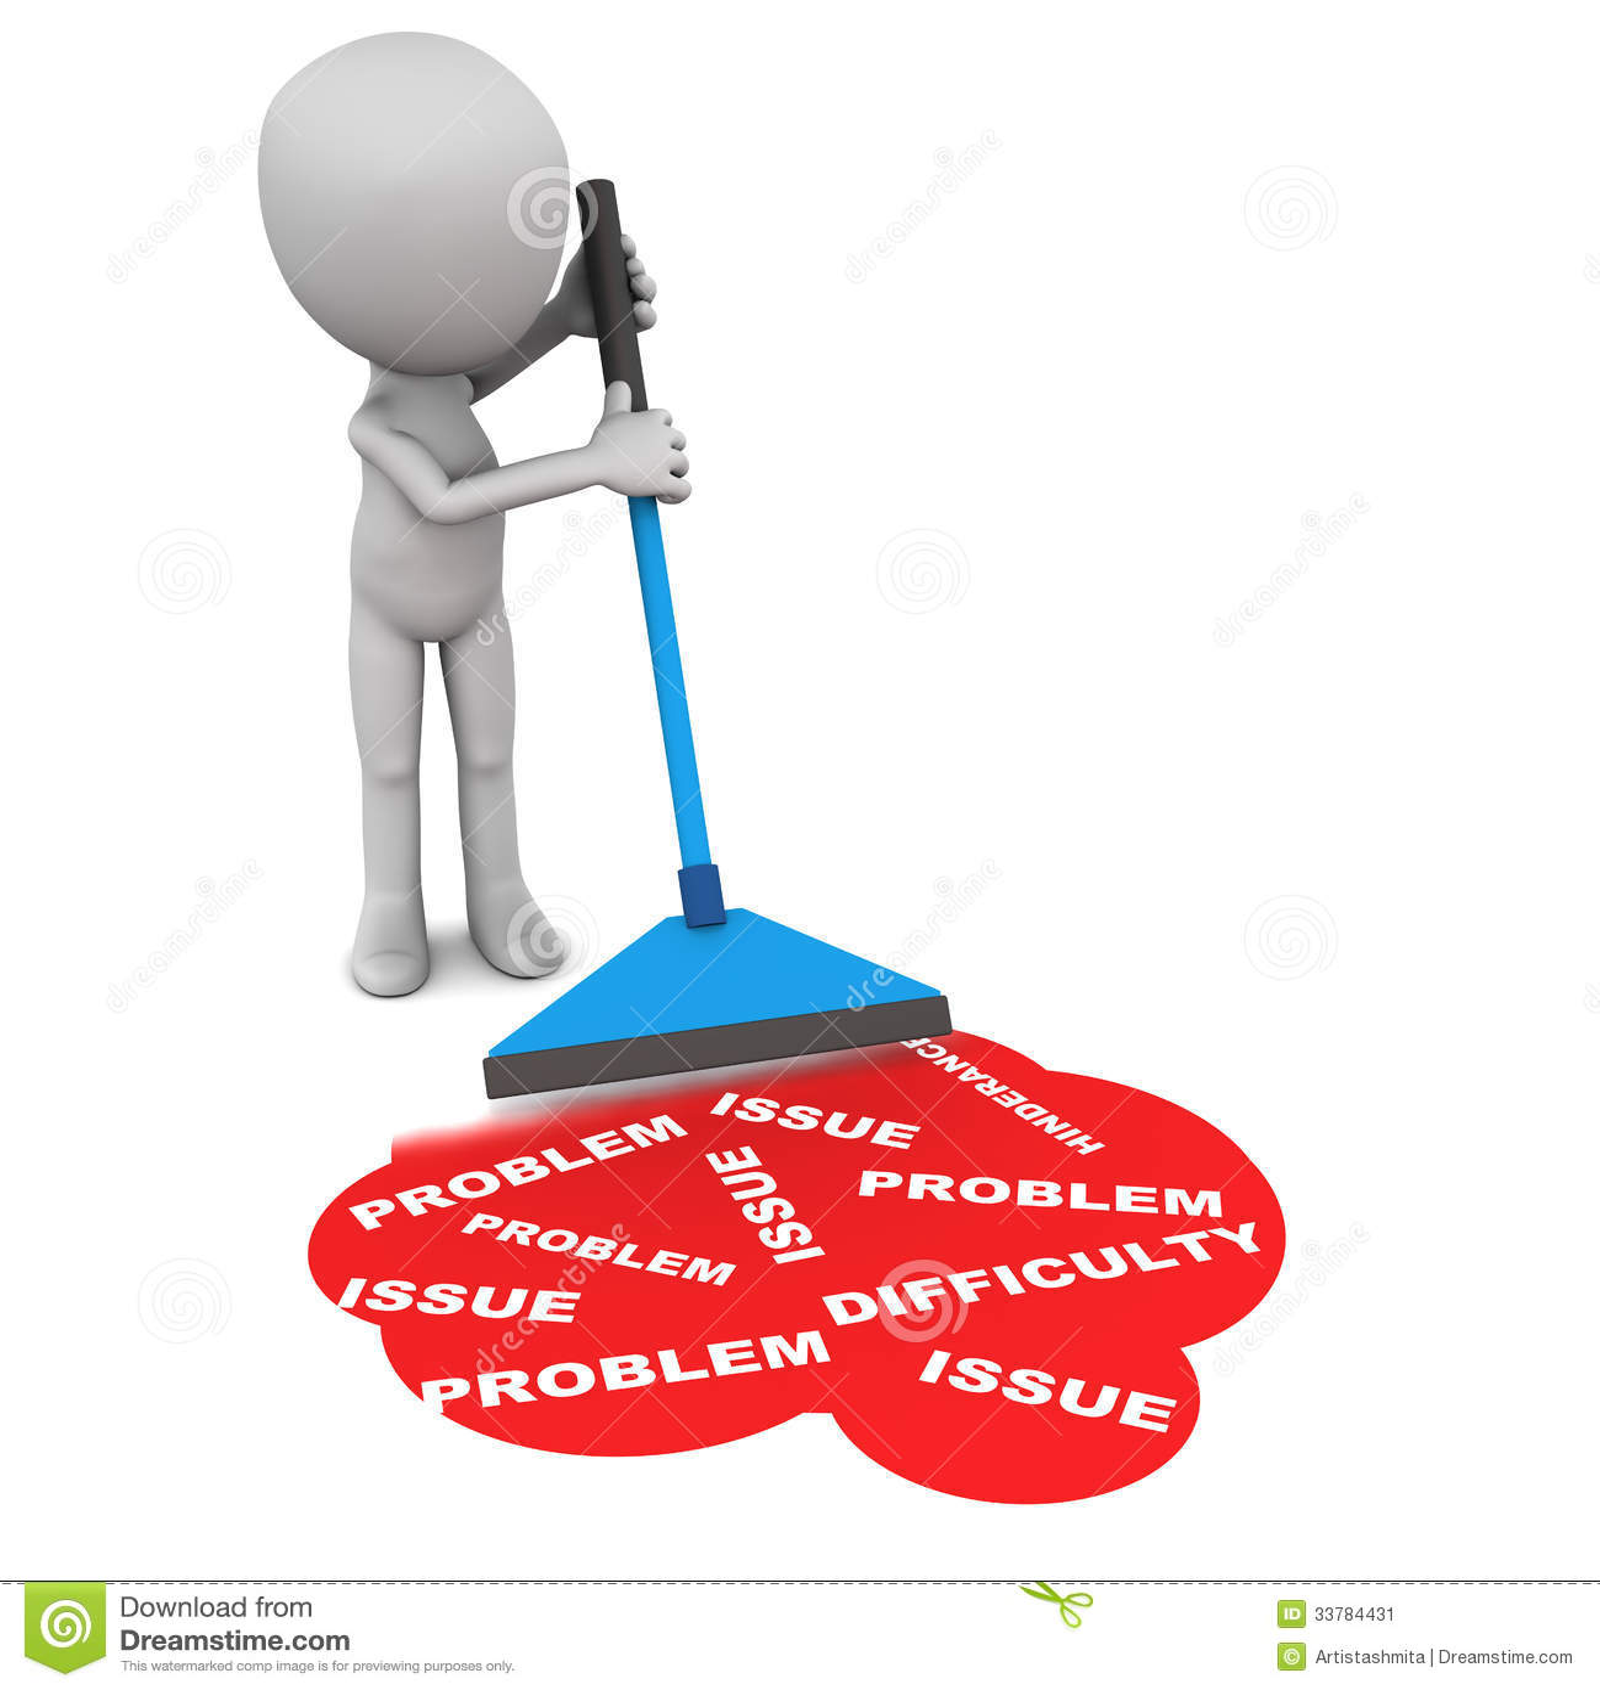 Troubleshoot Errors: Solve Problems Stock Illustration. Illustration Of Hurdle